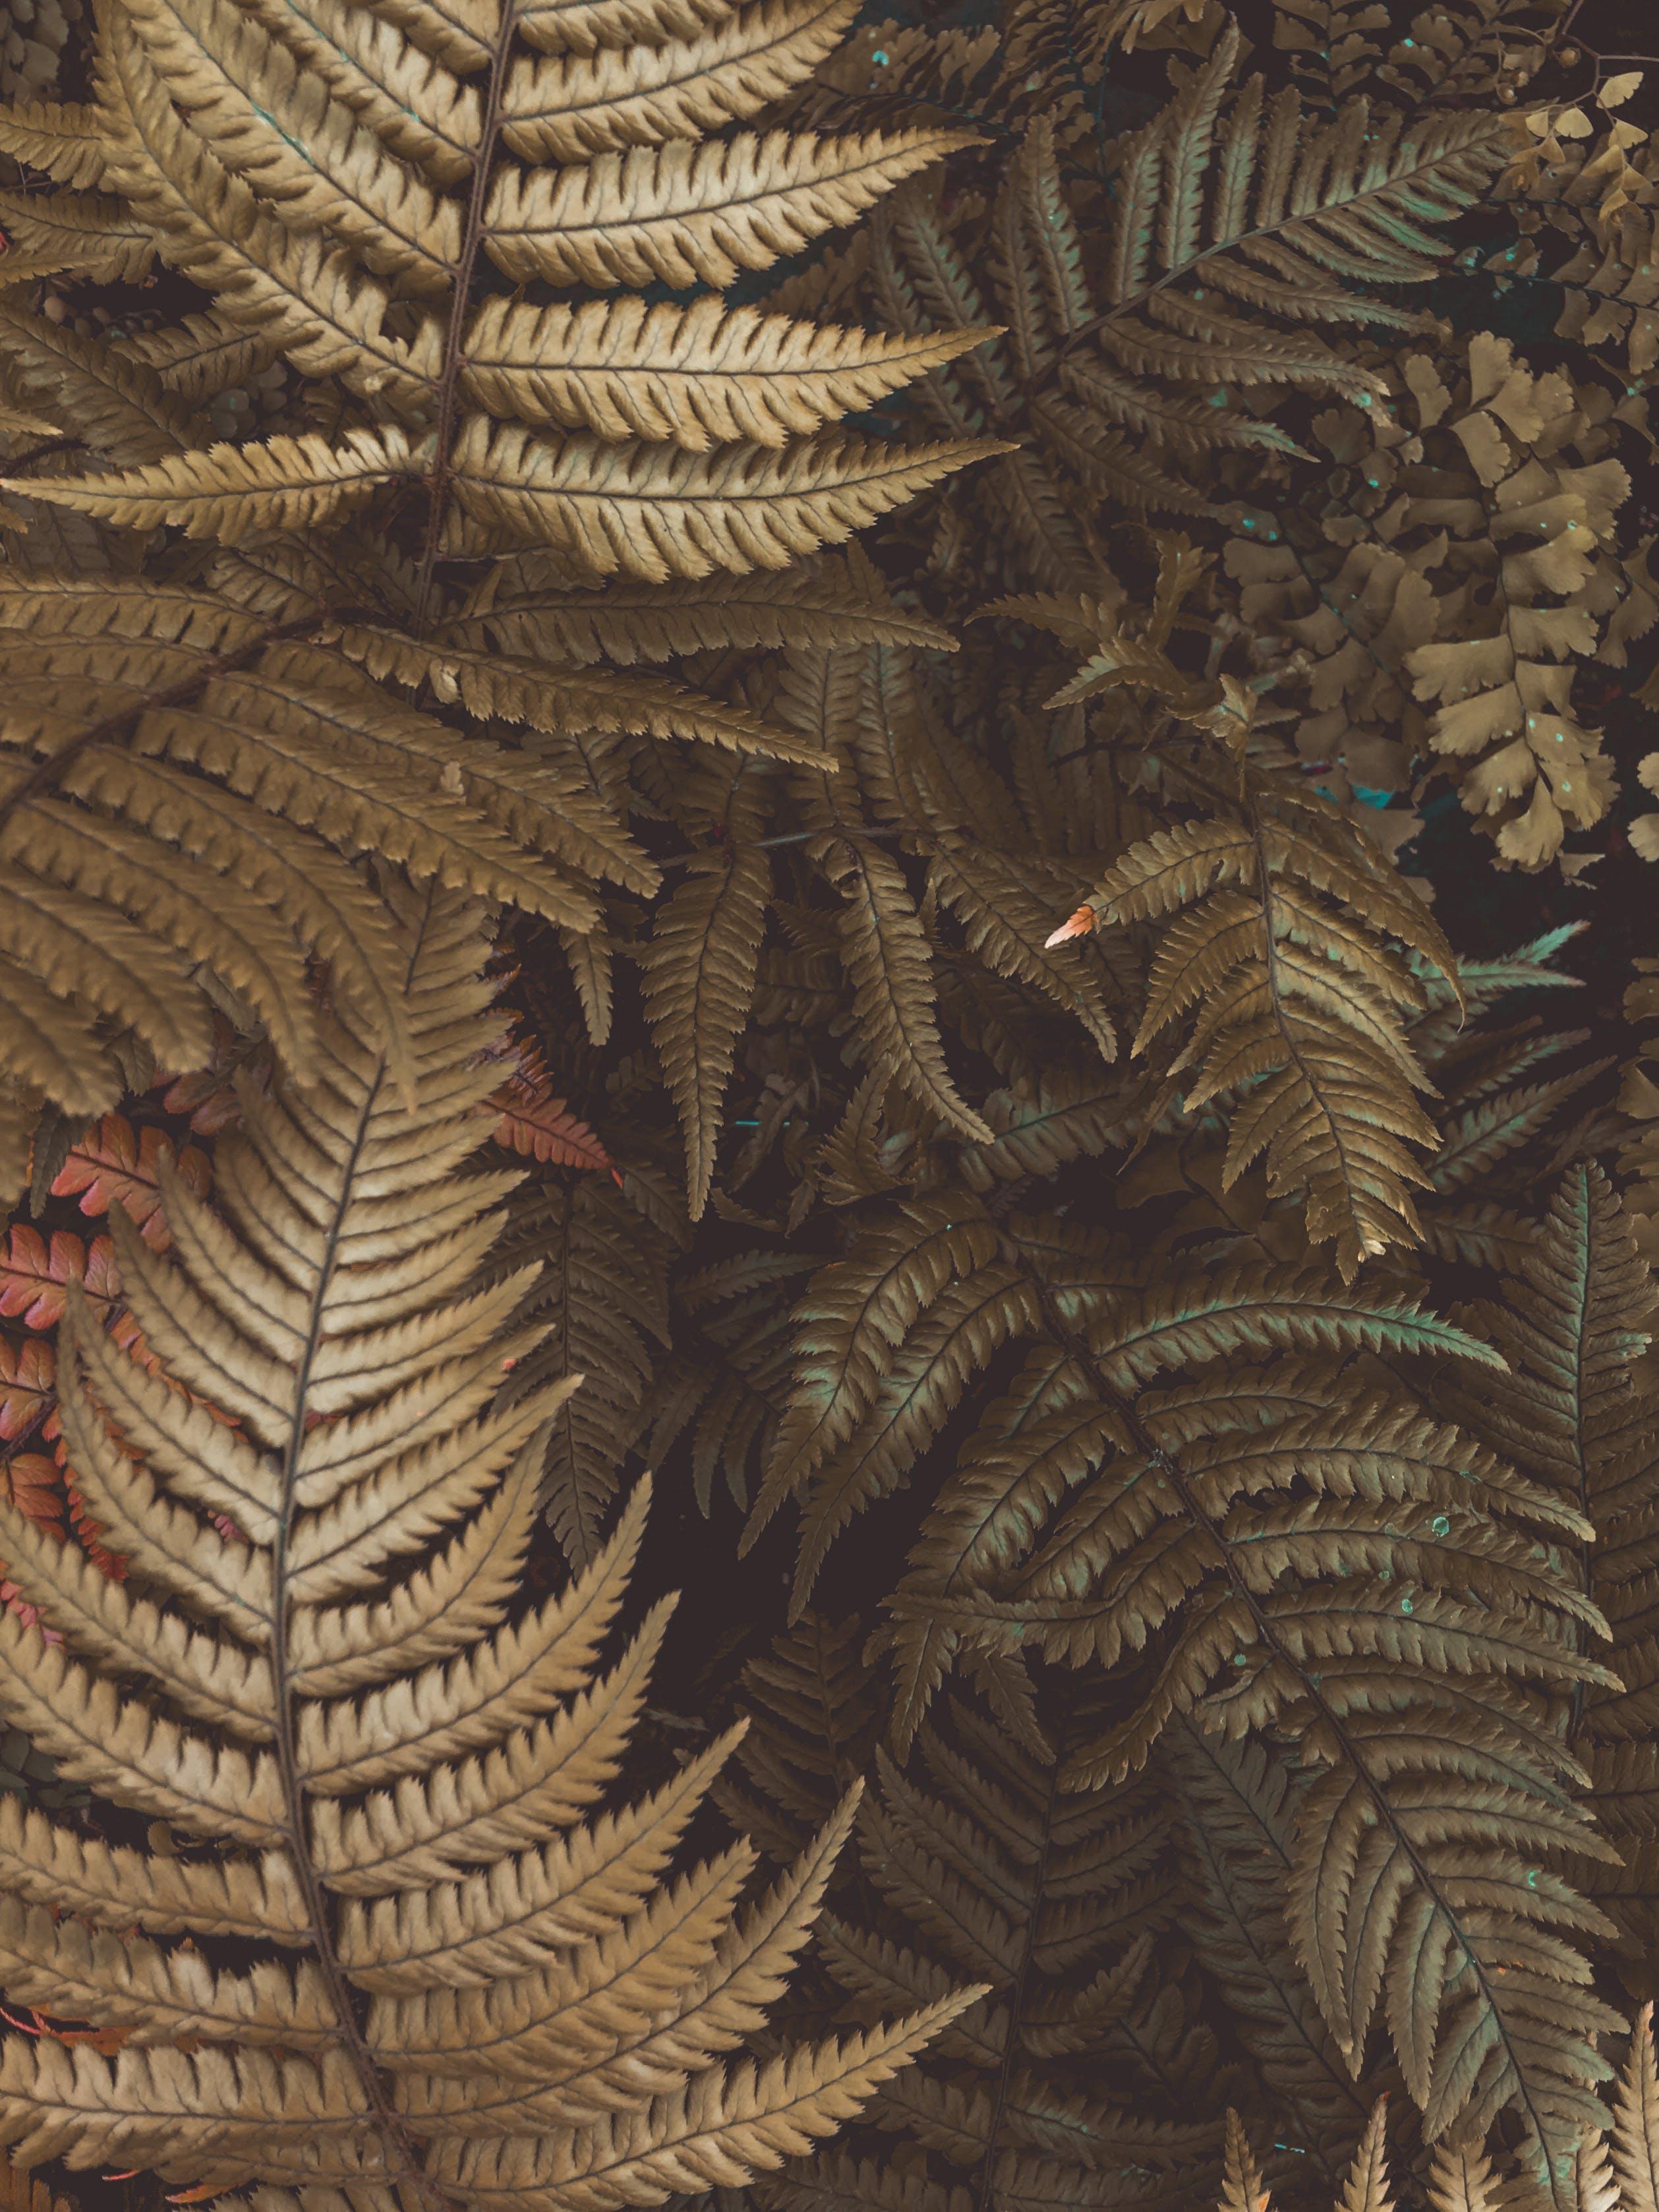 Photo of Fern Plants